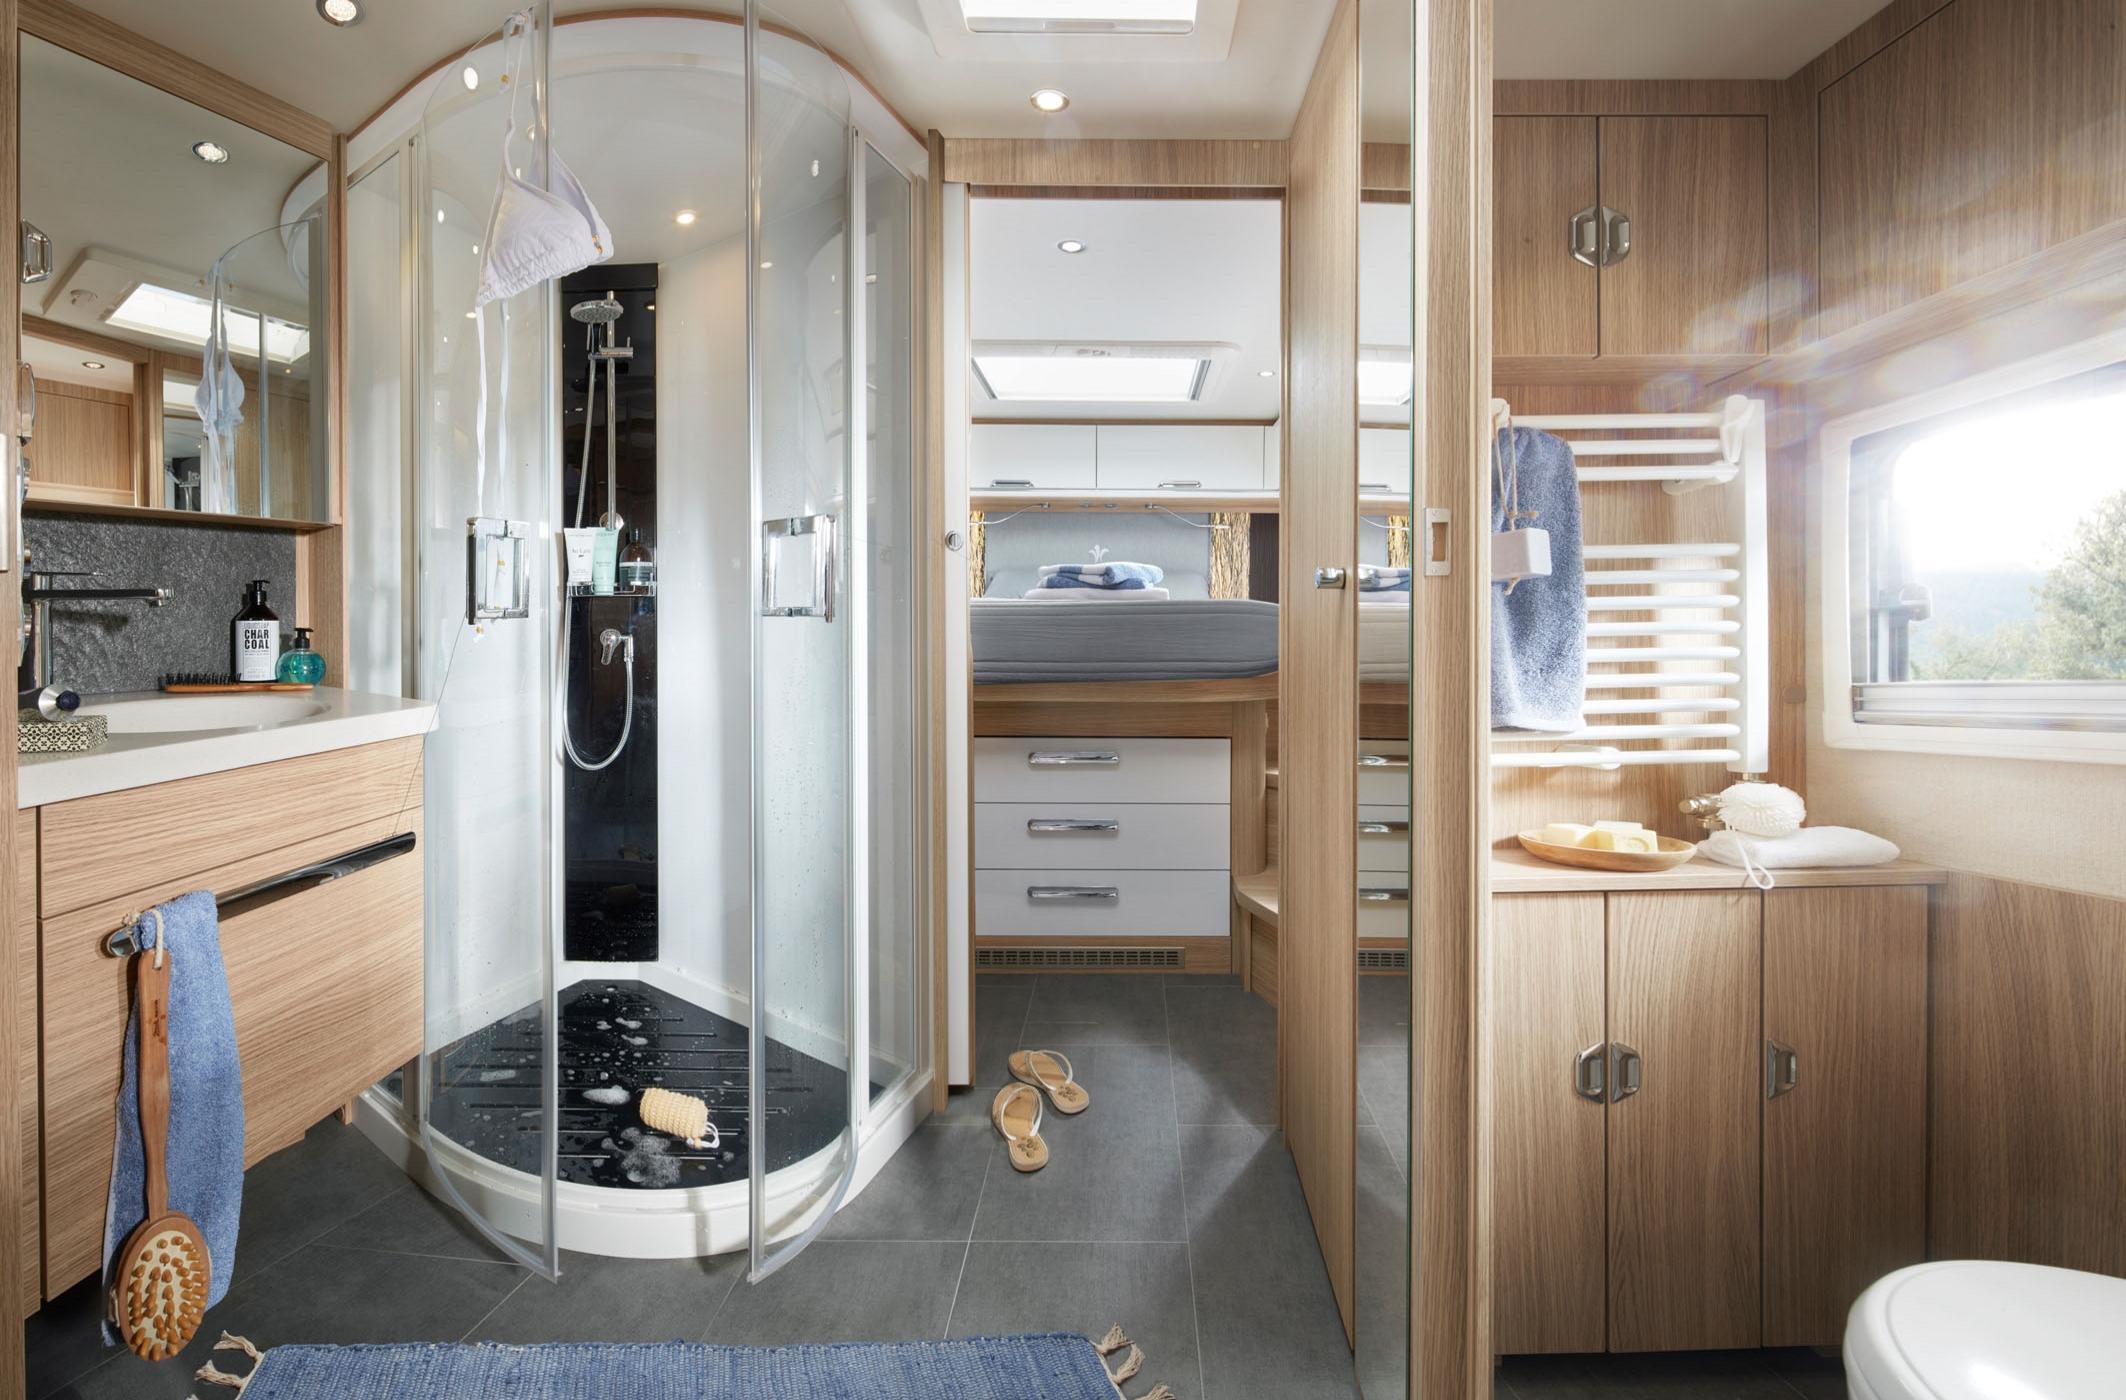 NIESMANN+BISCHOFF - Arto 88LF -  Spacieuse salle de bain luxueuse avec douche wellness